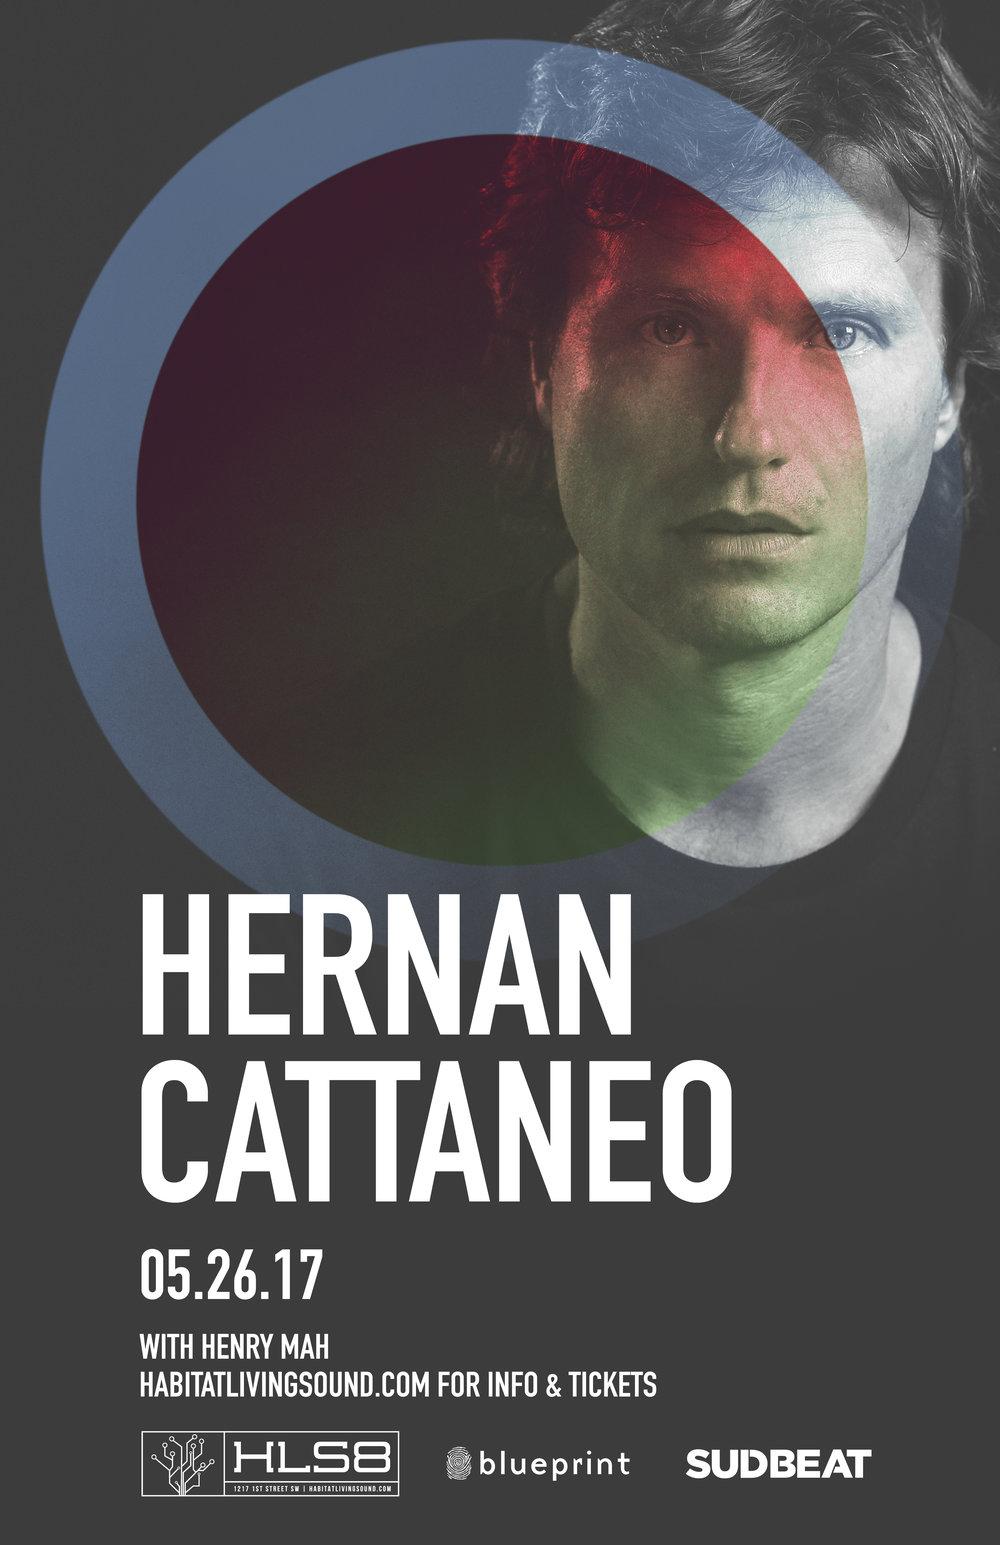 hernan-cataneo-habitat-2017.jpeg